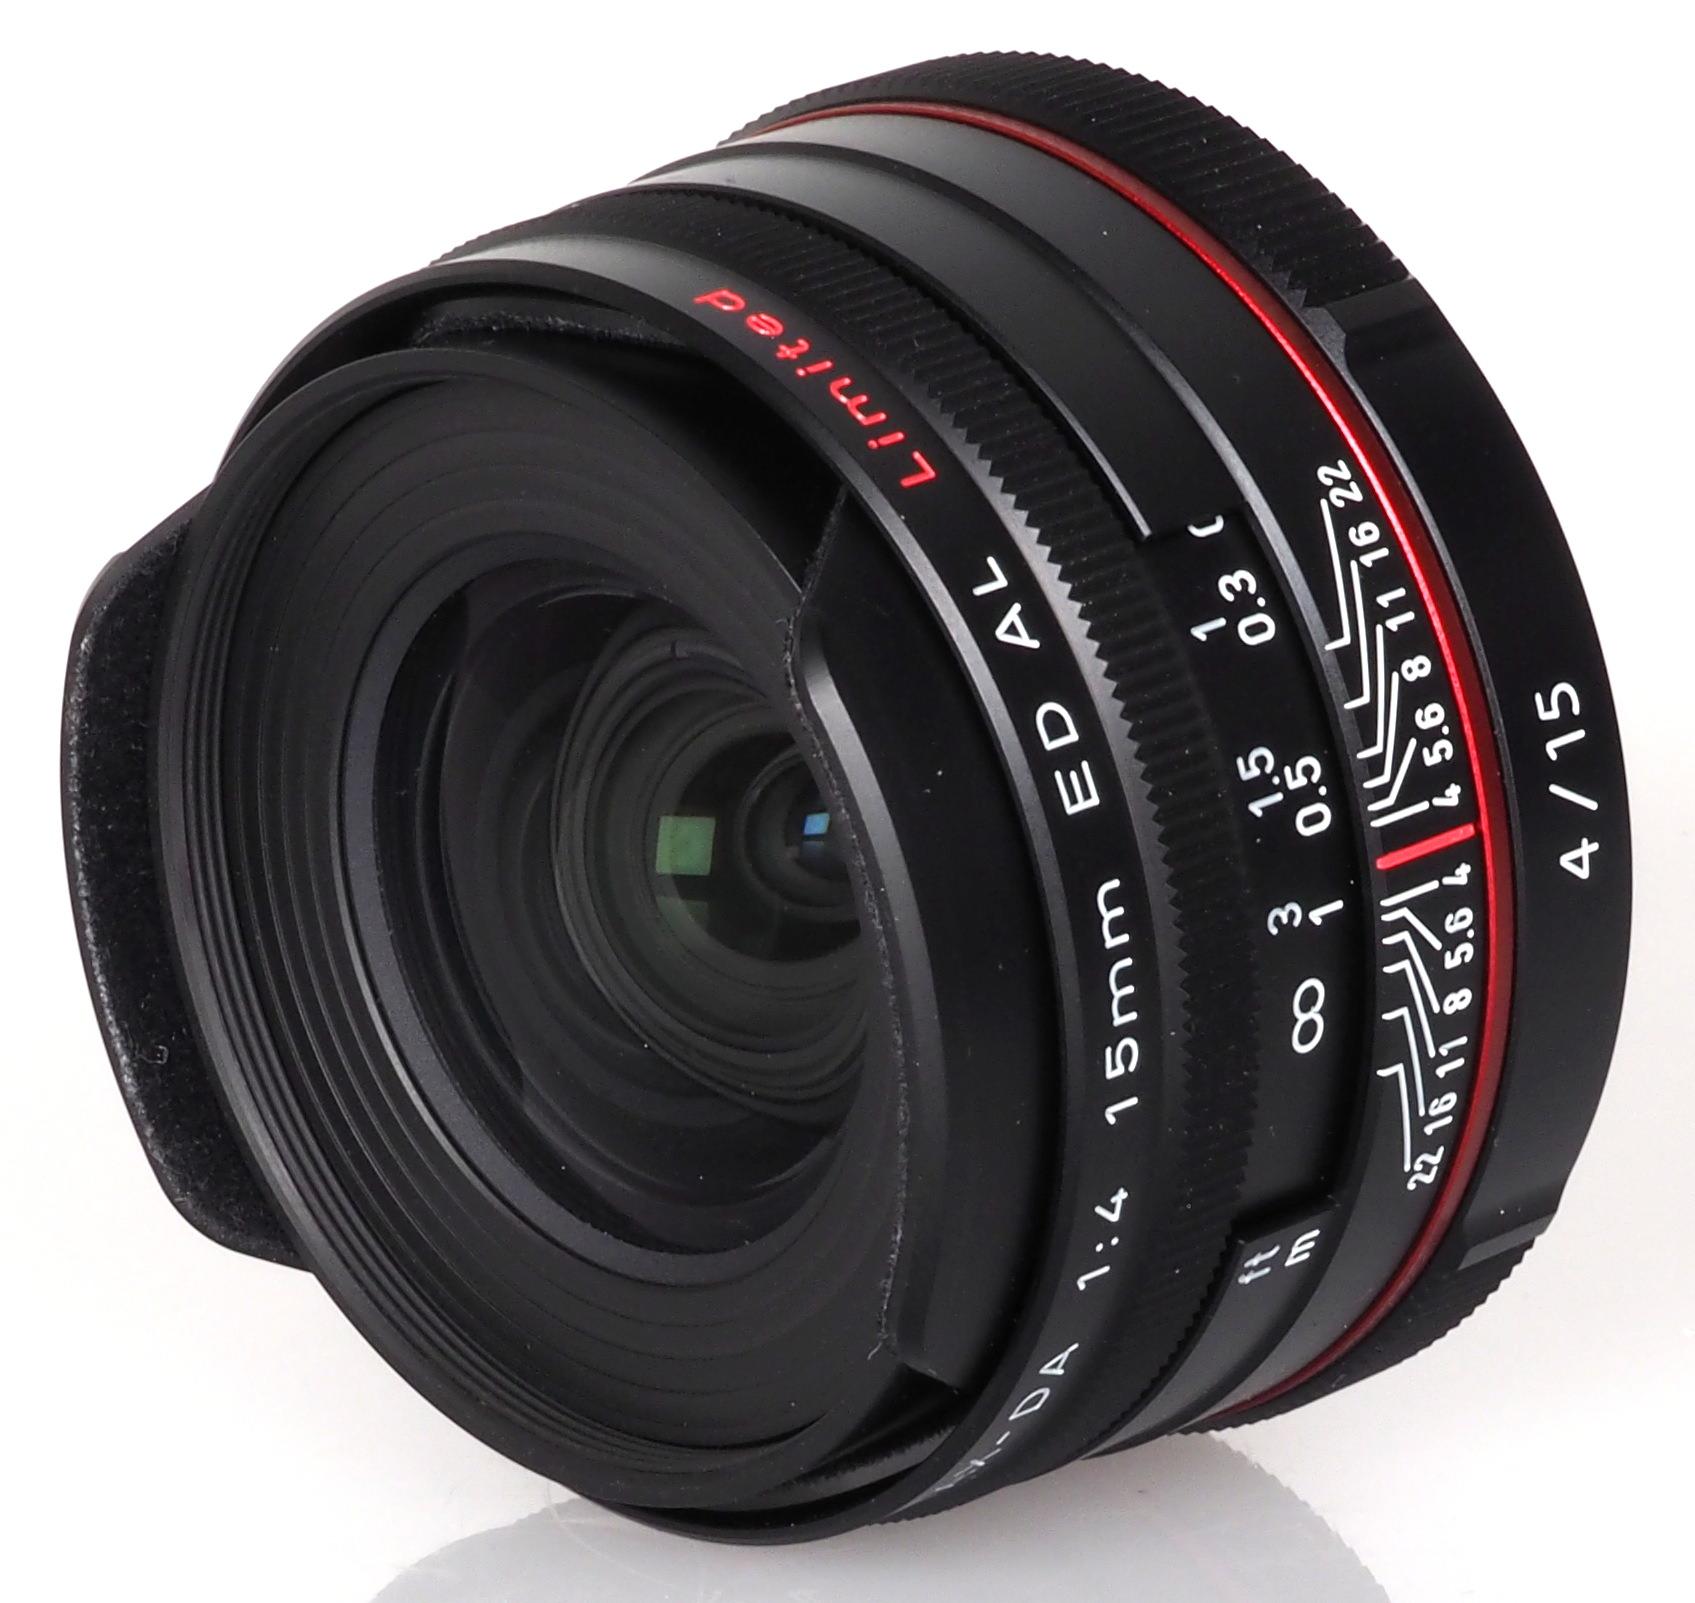 Bocci Len hd pentax da 15mm f 4 ed al limited lens review